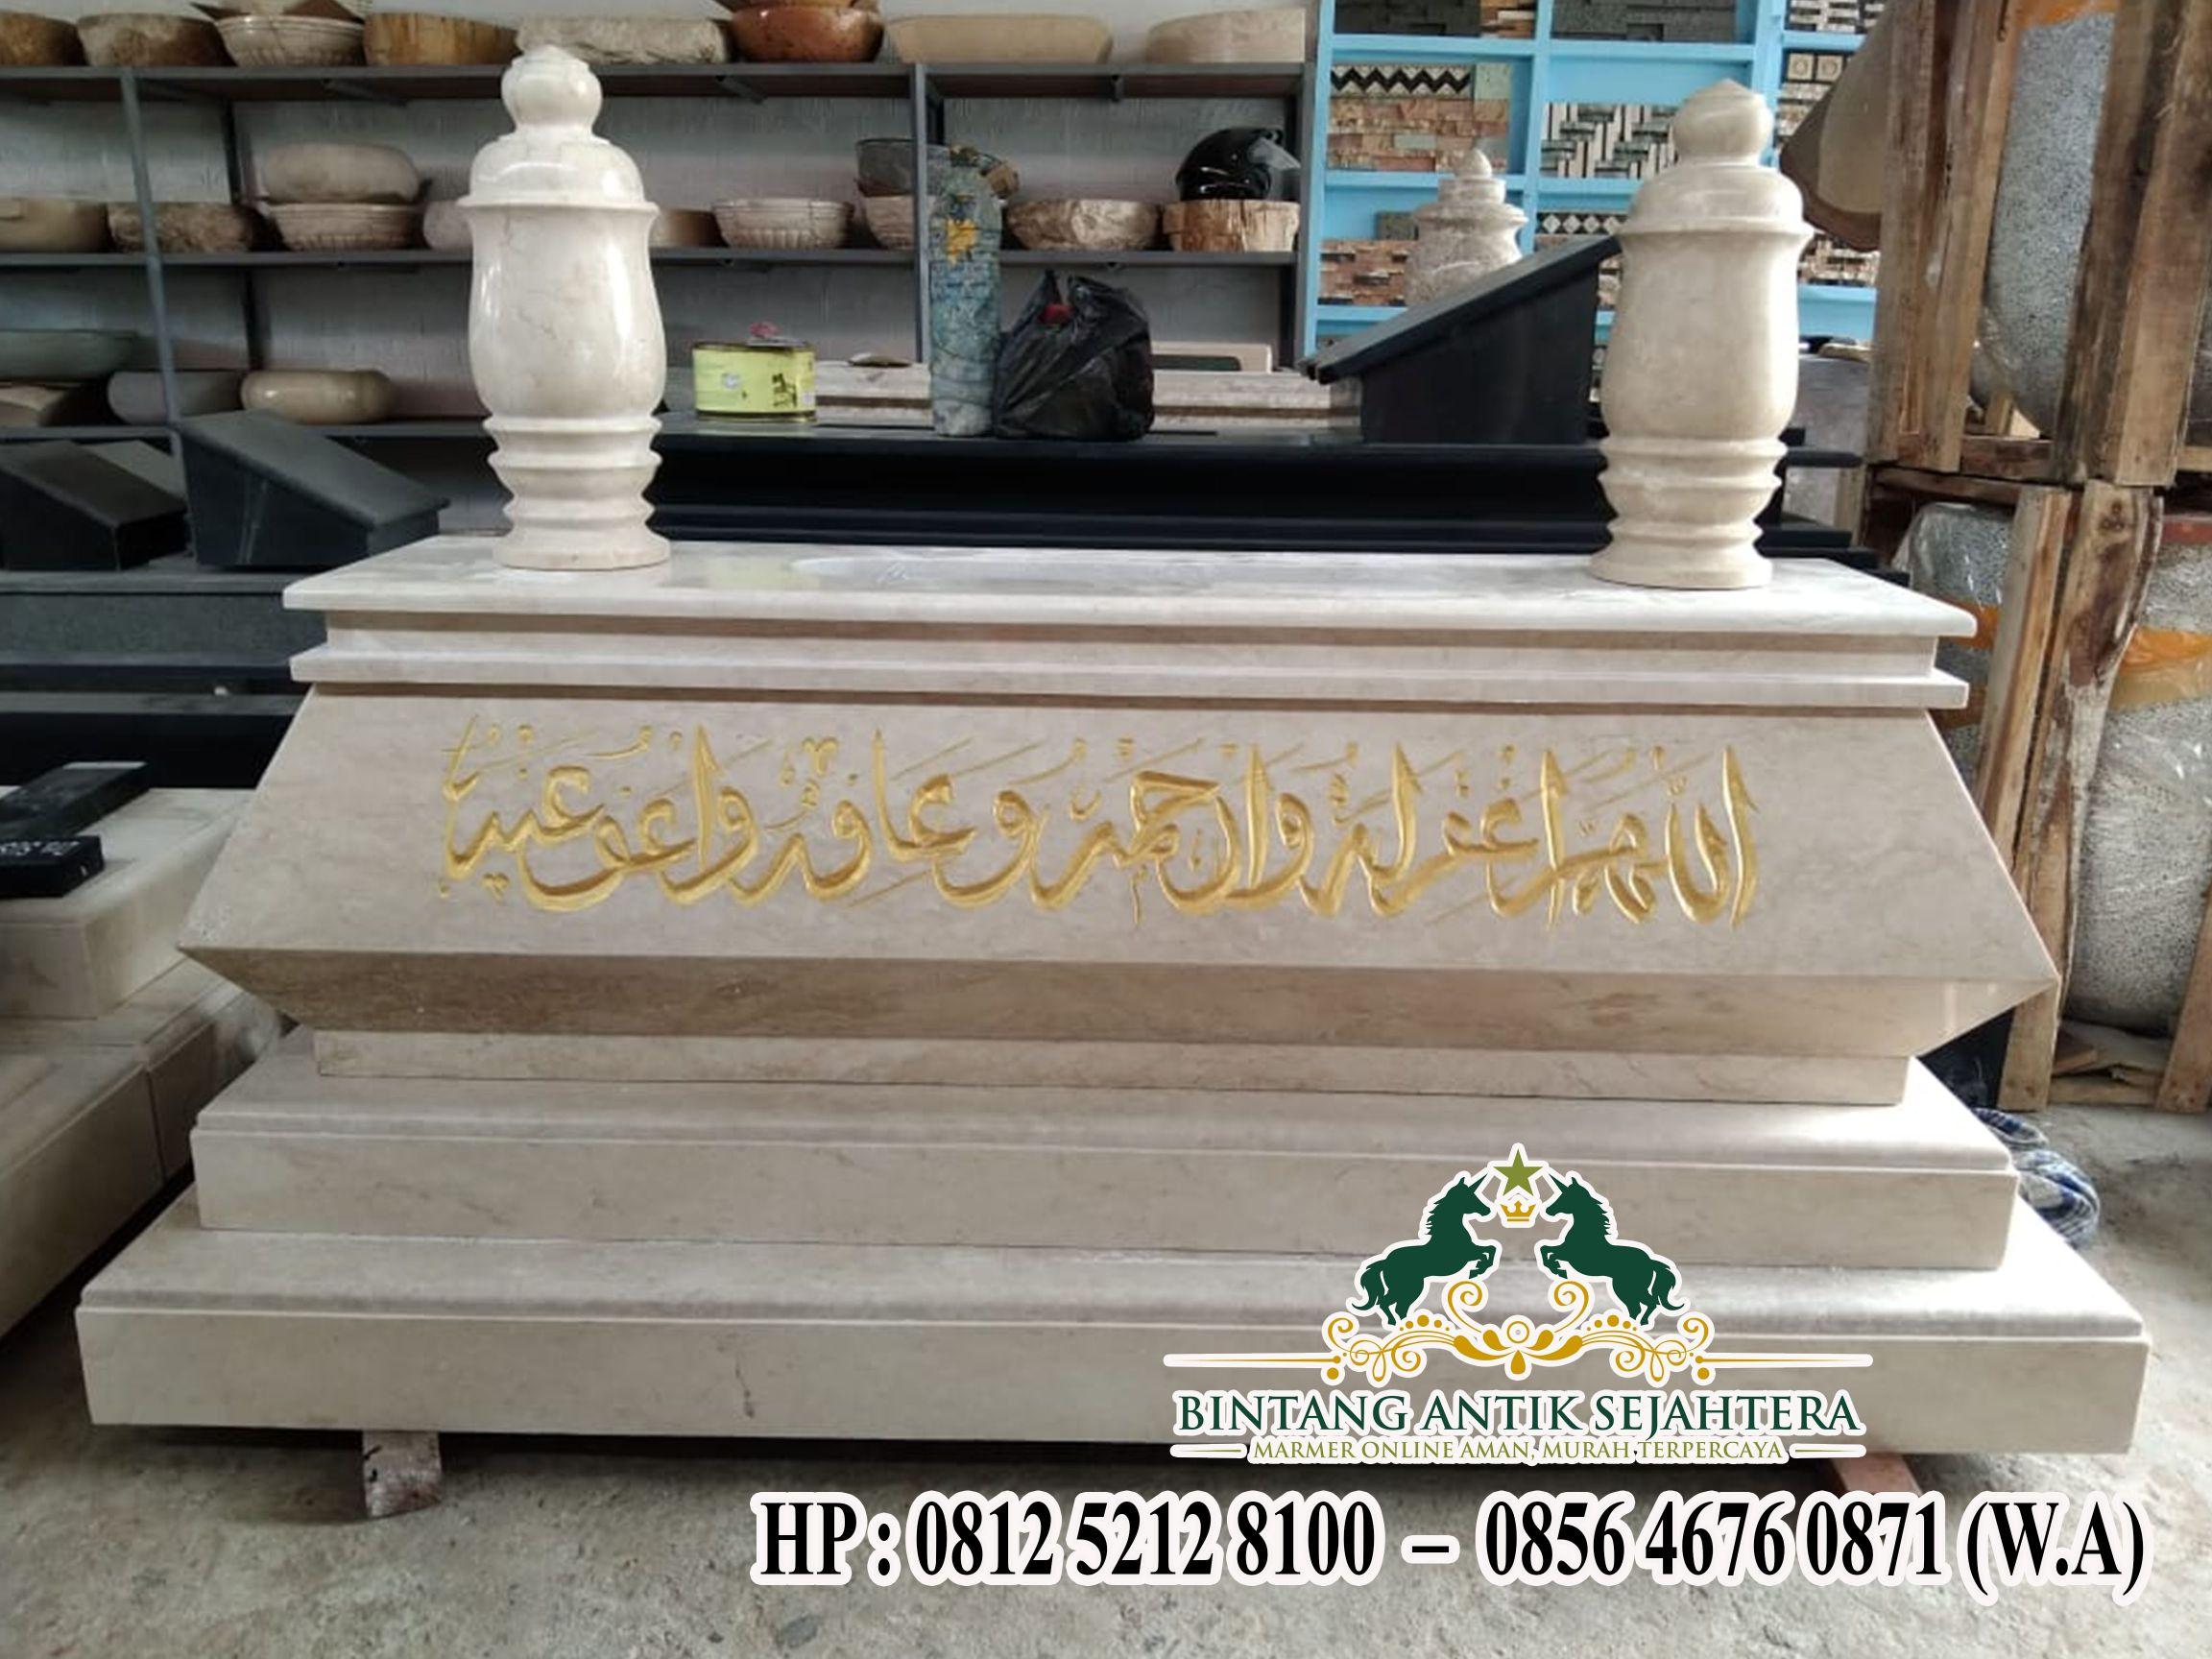 Makam Marmer Model Bokoran, Model Bokoran Marmer